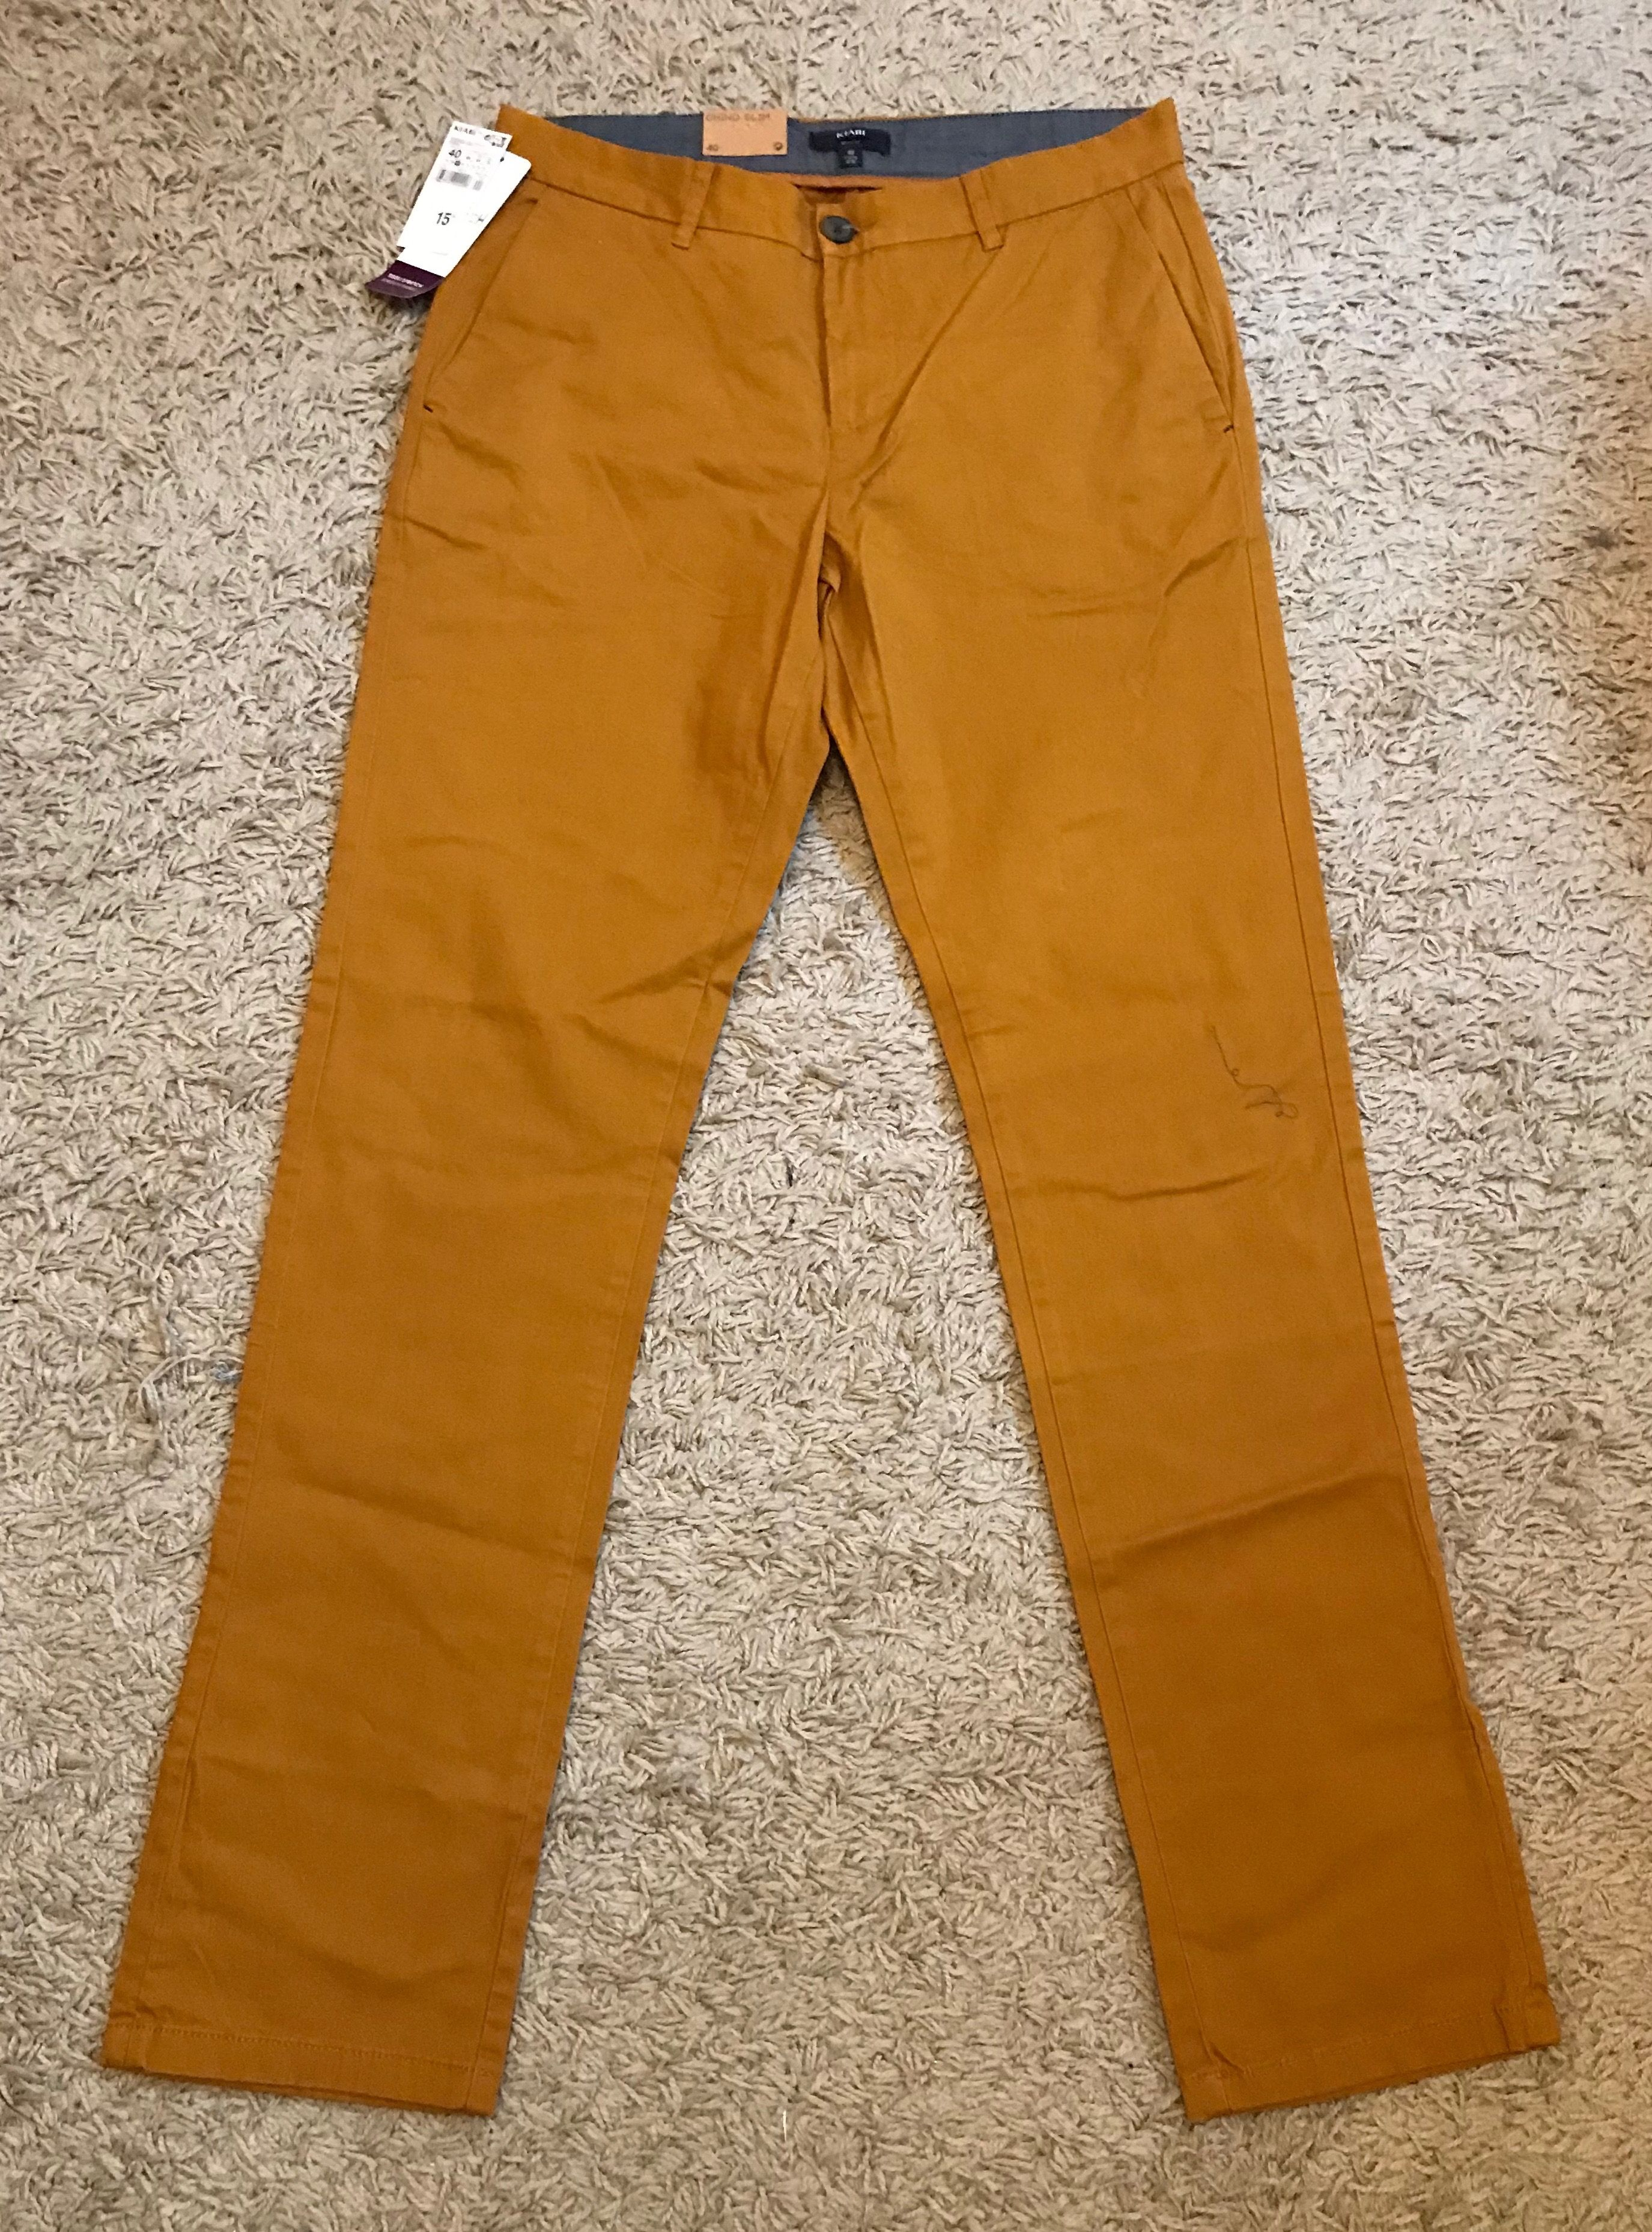 pantalon orange homme zara